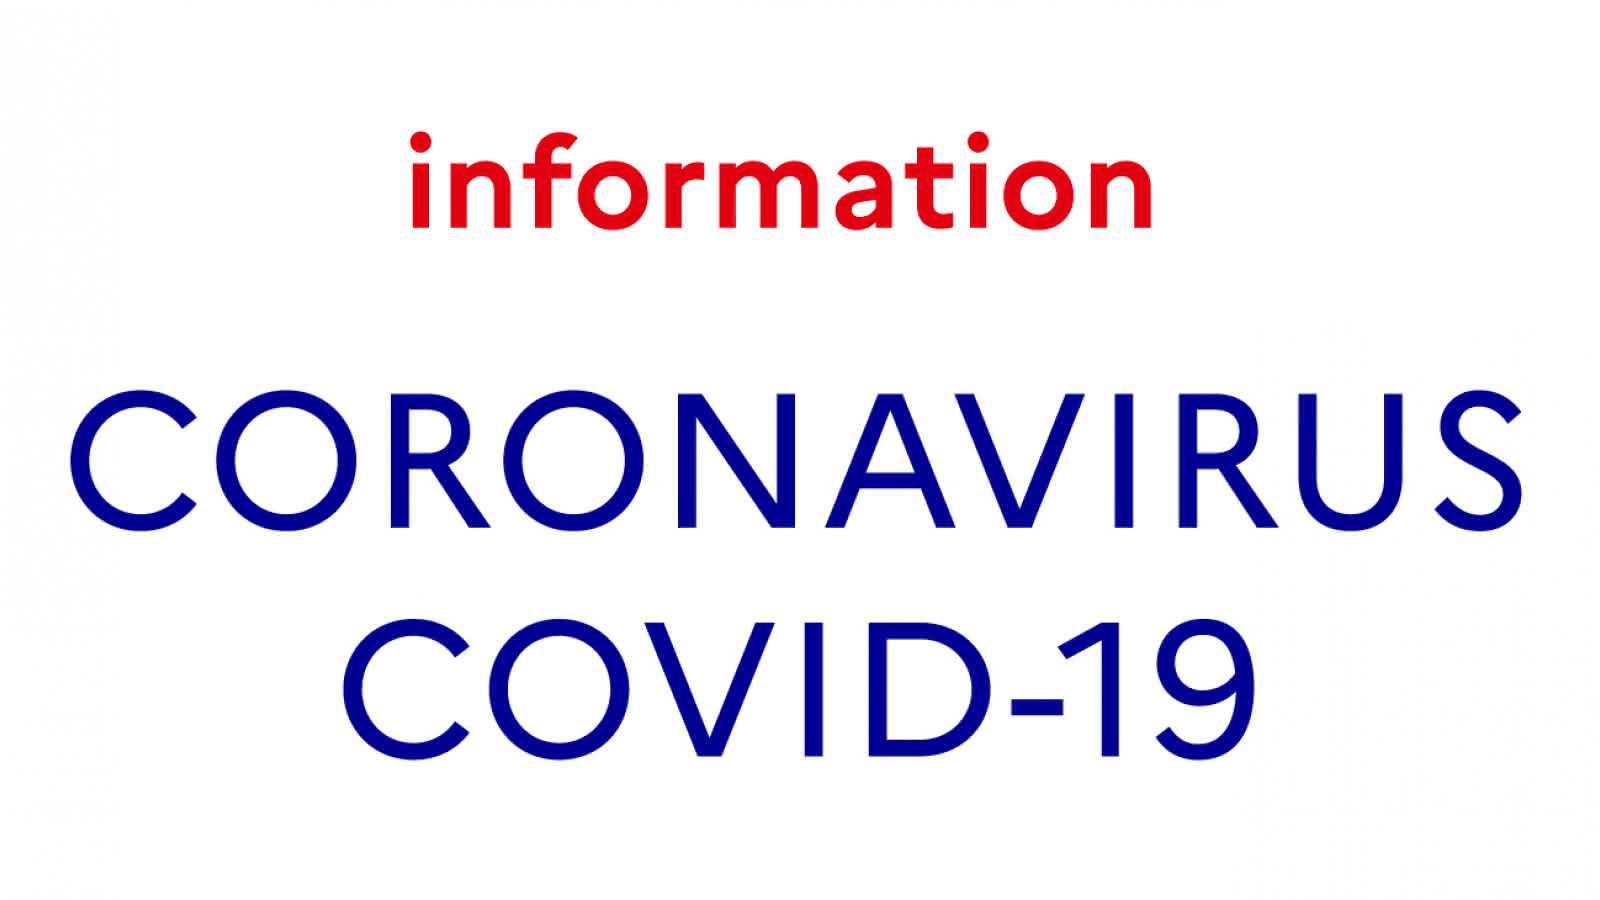 Image Information Coronavirus Covid-19